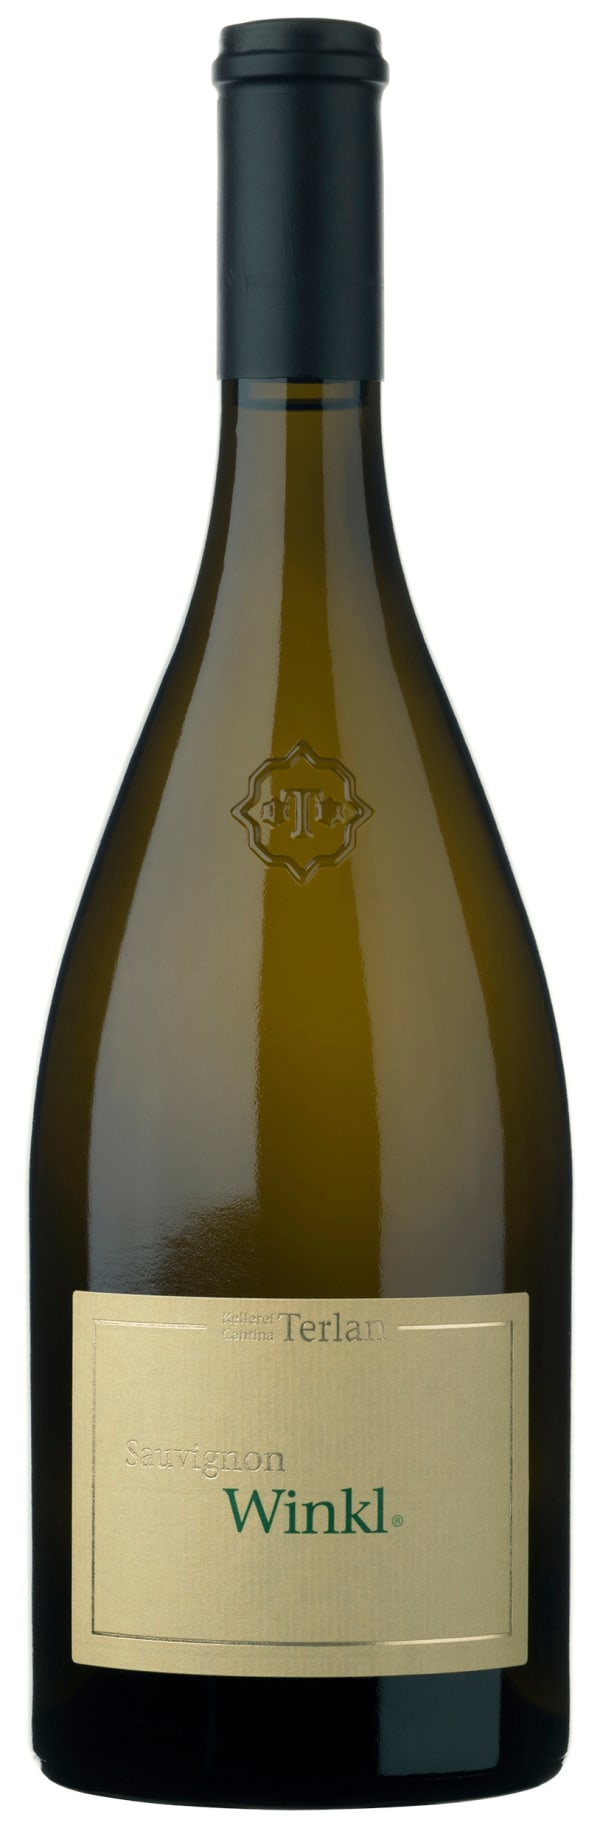 Terlano Winkl Sauvignon Blanc 2018